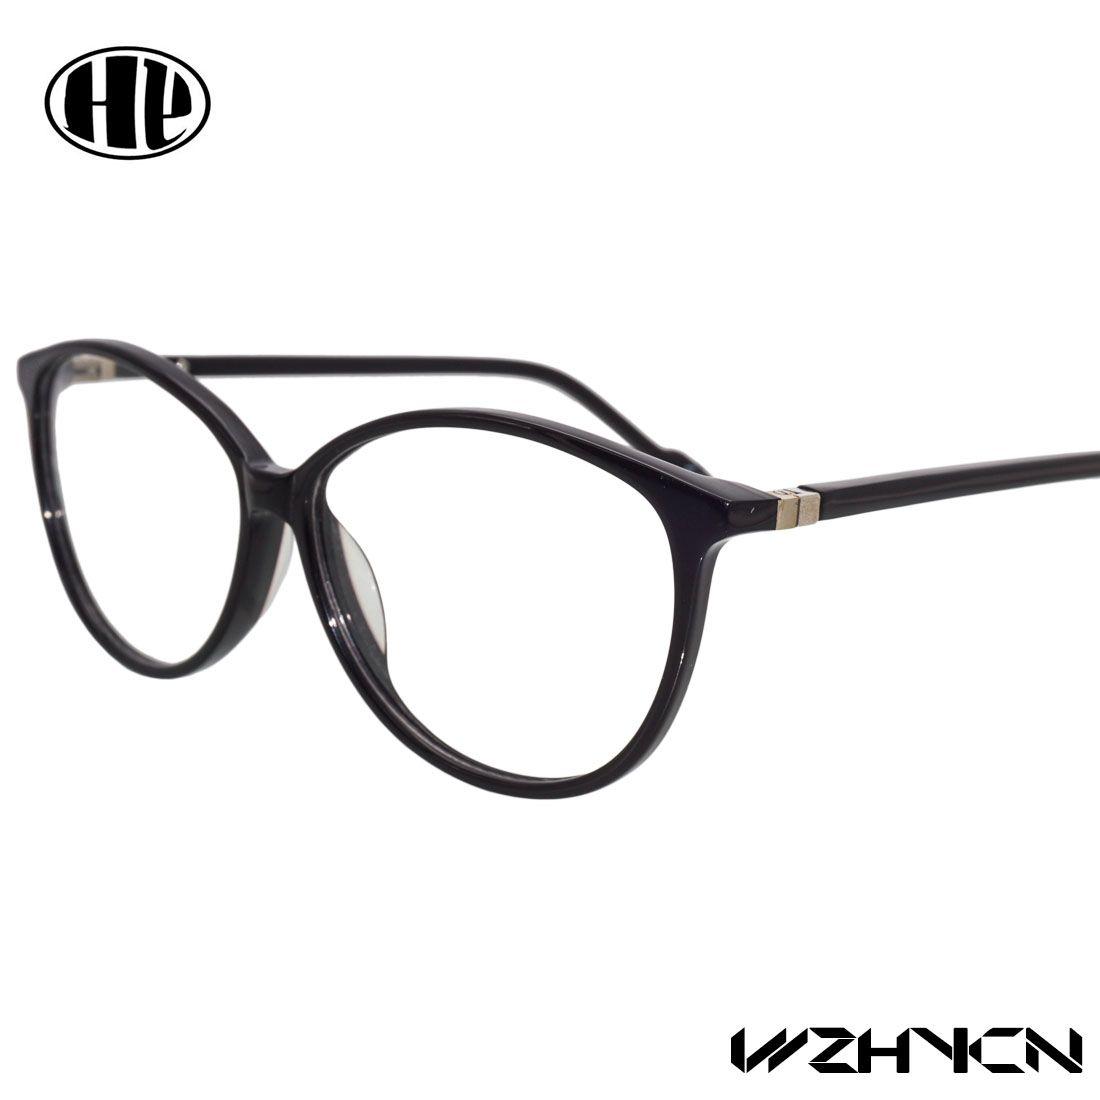 e0769b3b2e1 2017 New Retro Eyewear Clear Lens Optical Frame High Quality Oculos ...